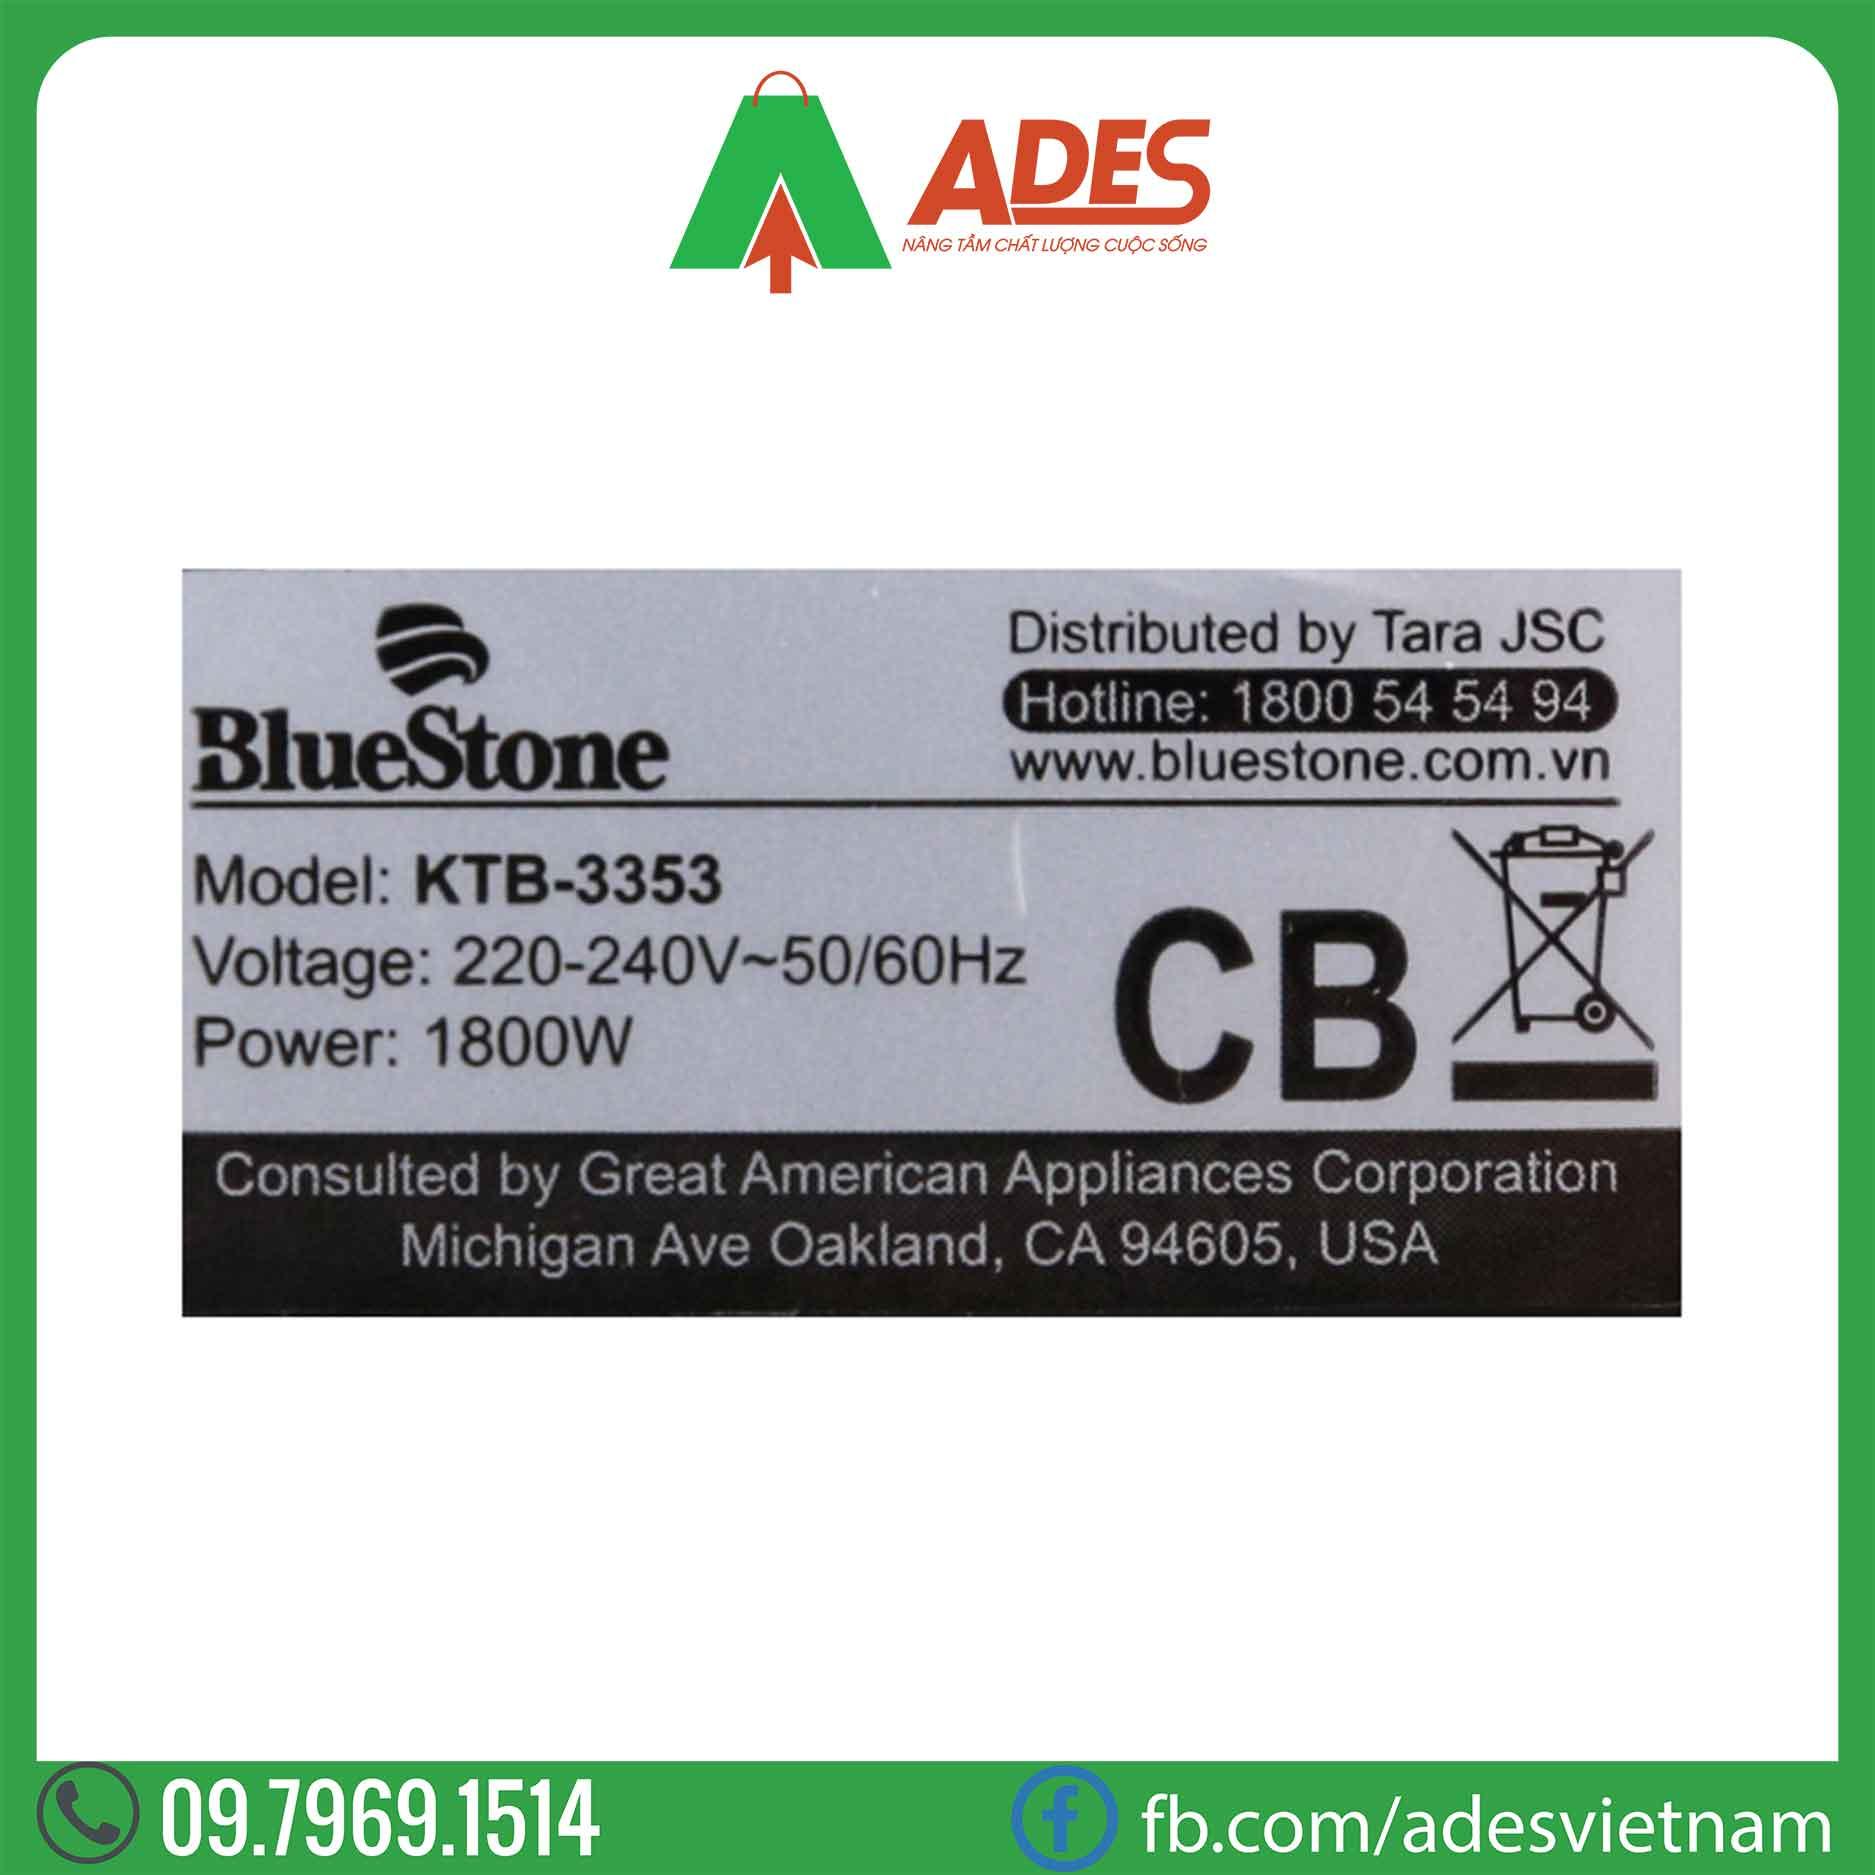 Am sieu toc Bluestone KTB-3353